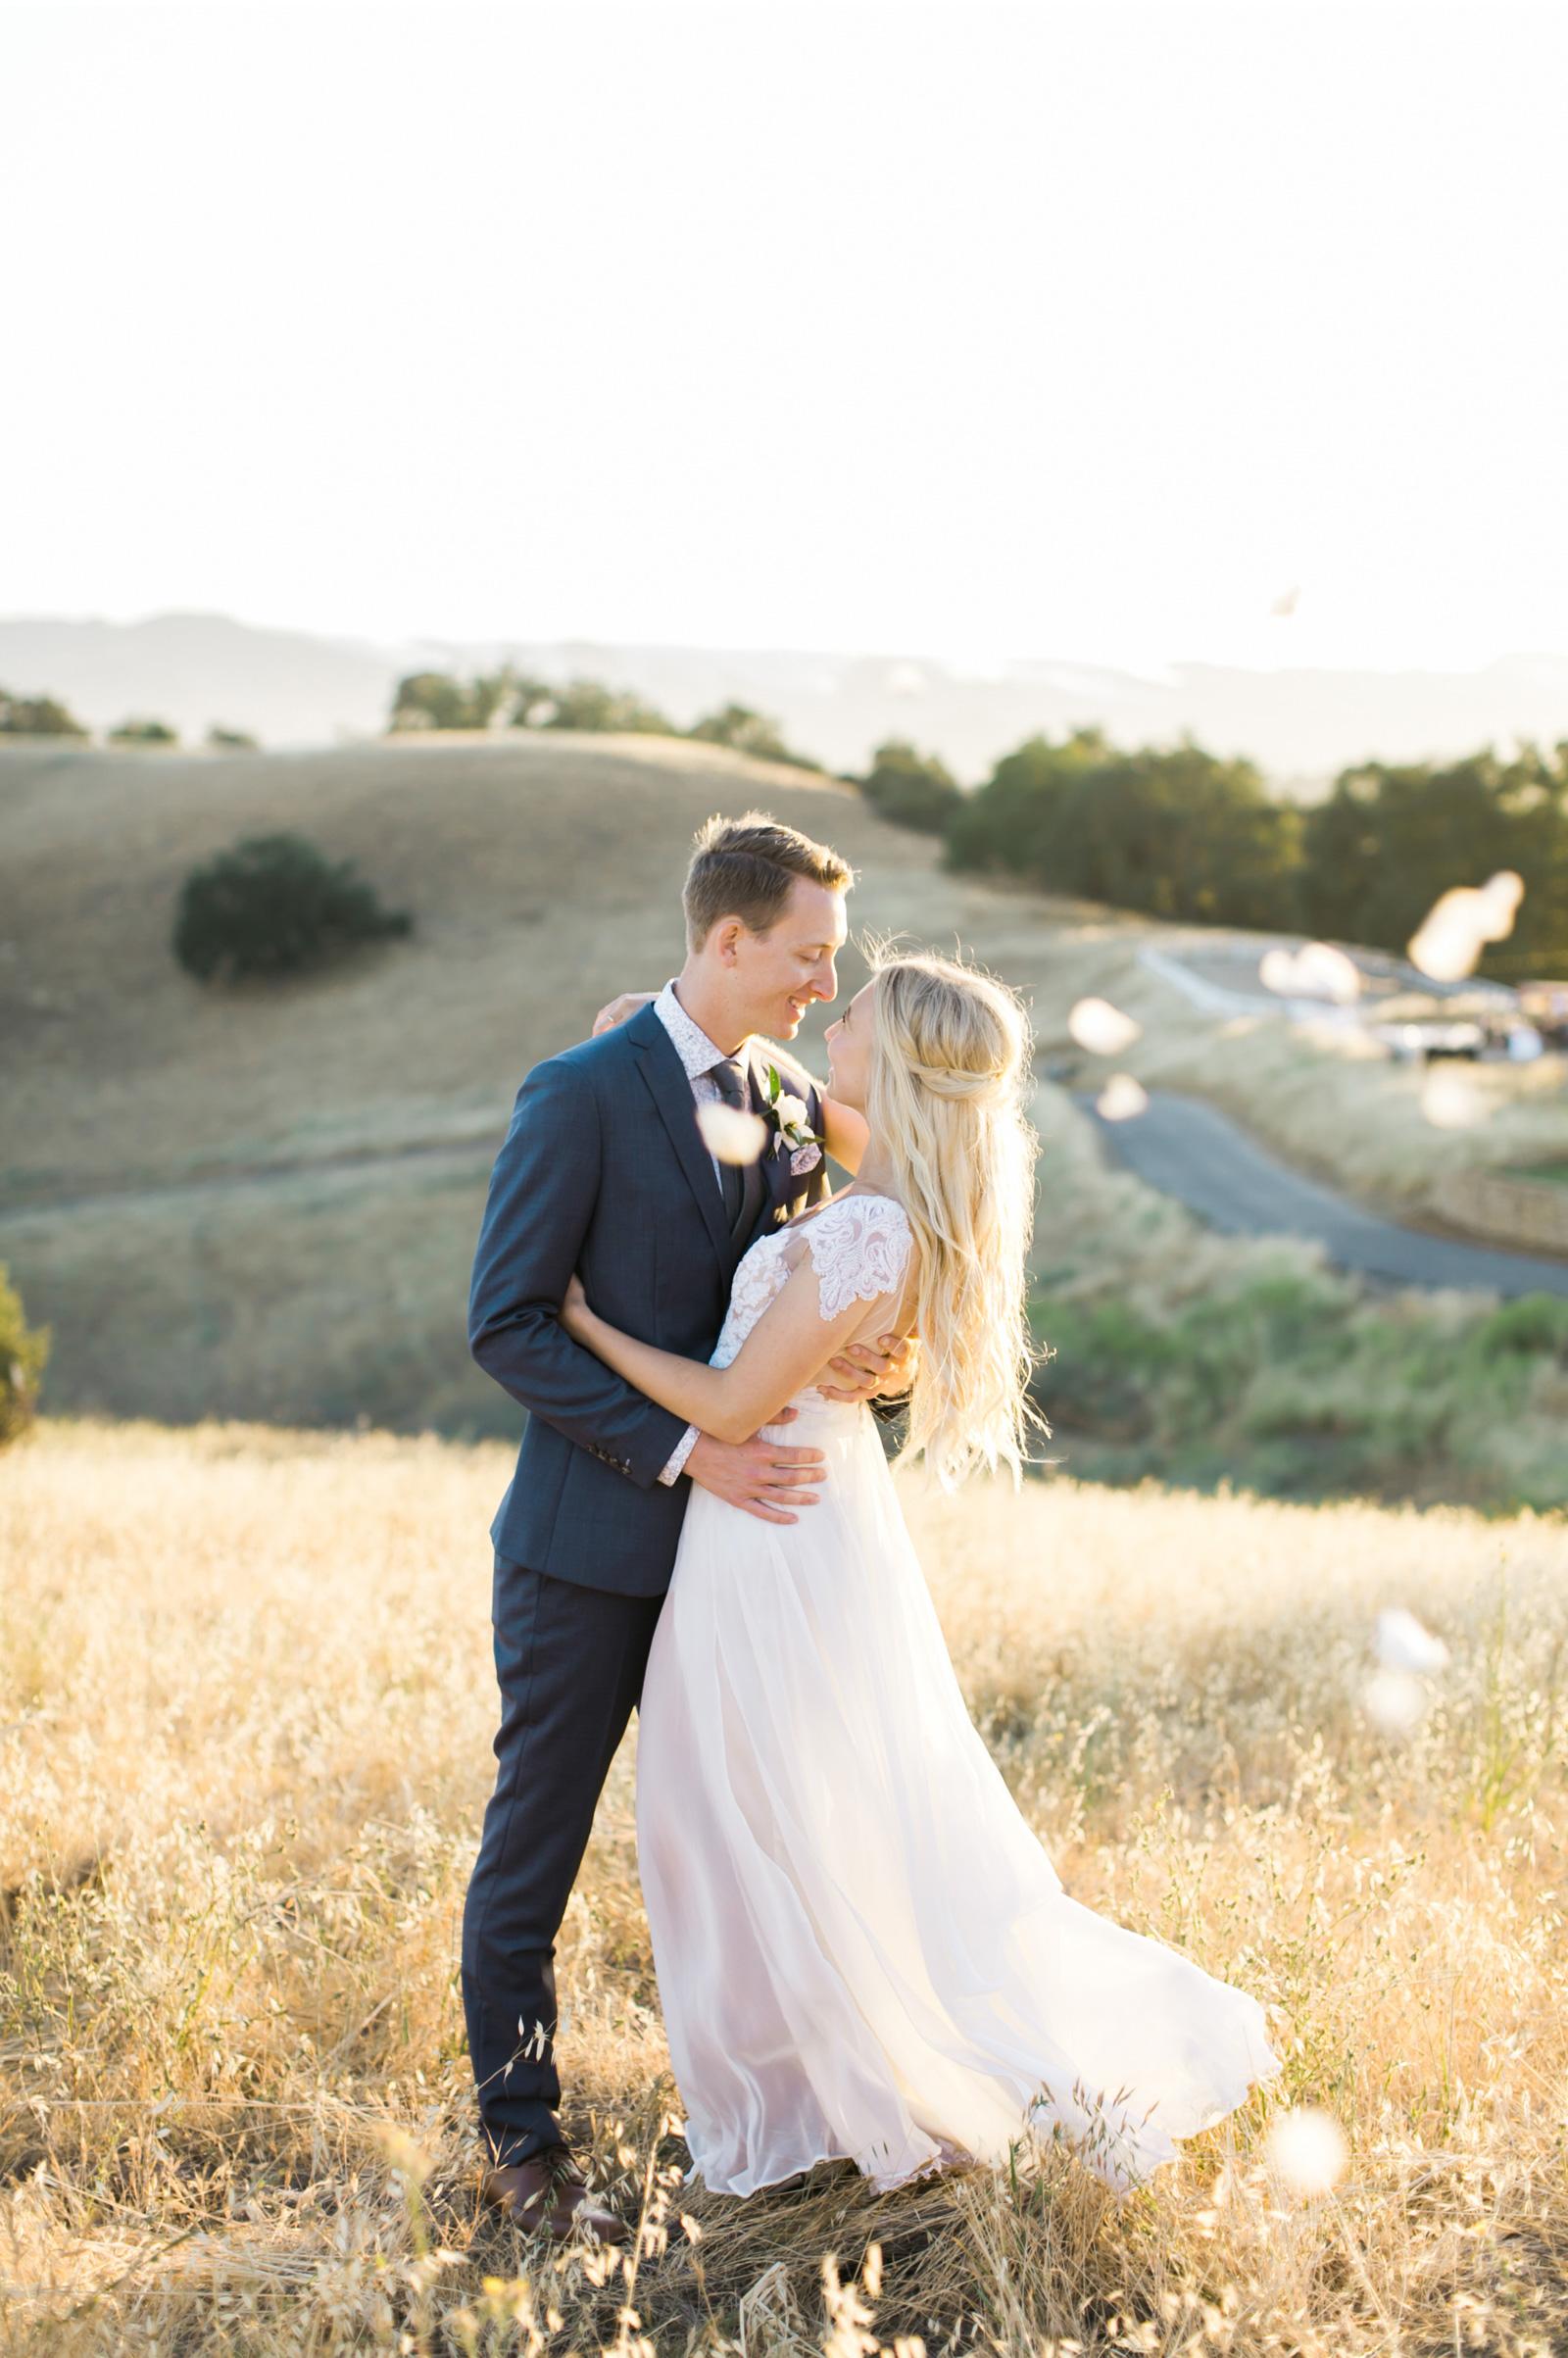 Natalie-Schutt-Photography's-Wedding-Style-Me-Pretty-Paso-Robles_01.jpg